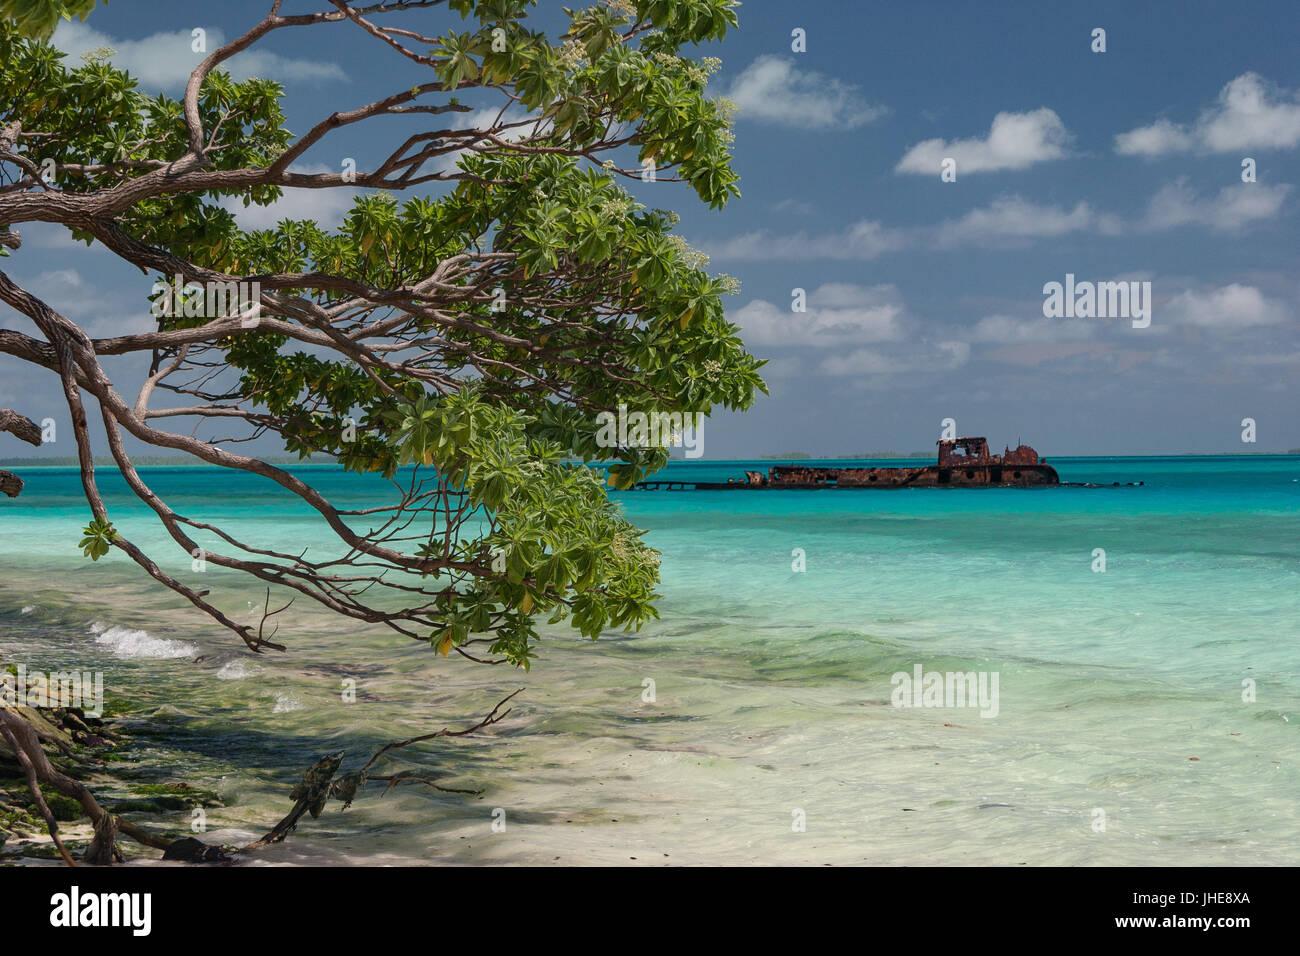 ship to Kiribati - Stock Image